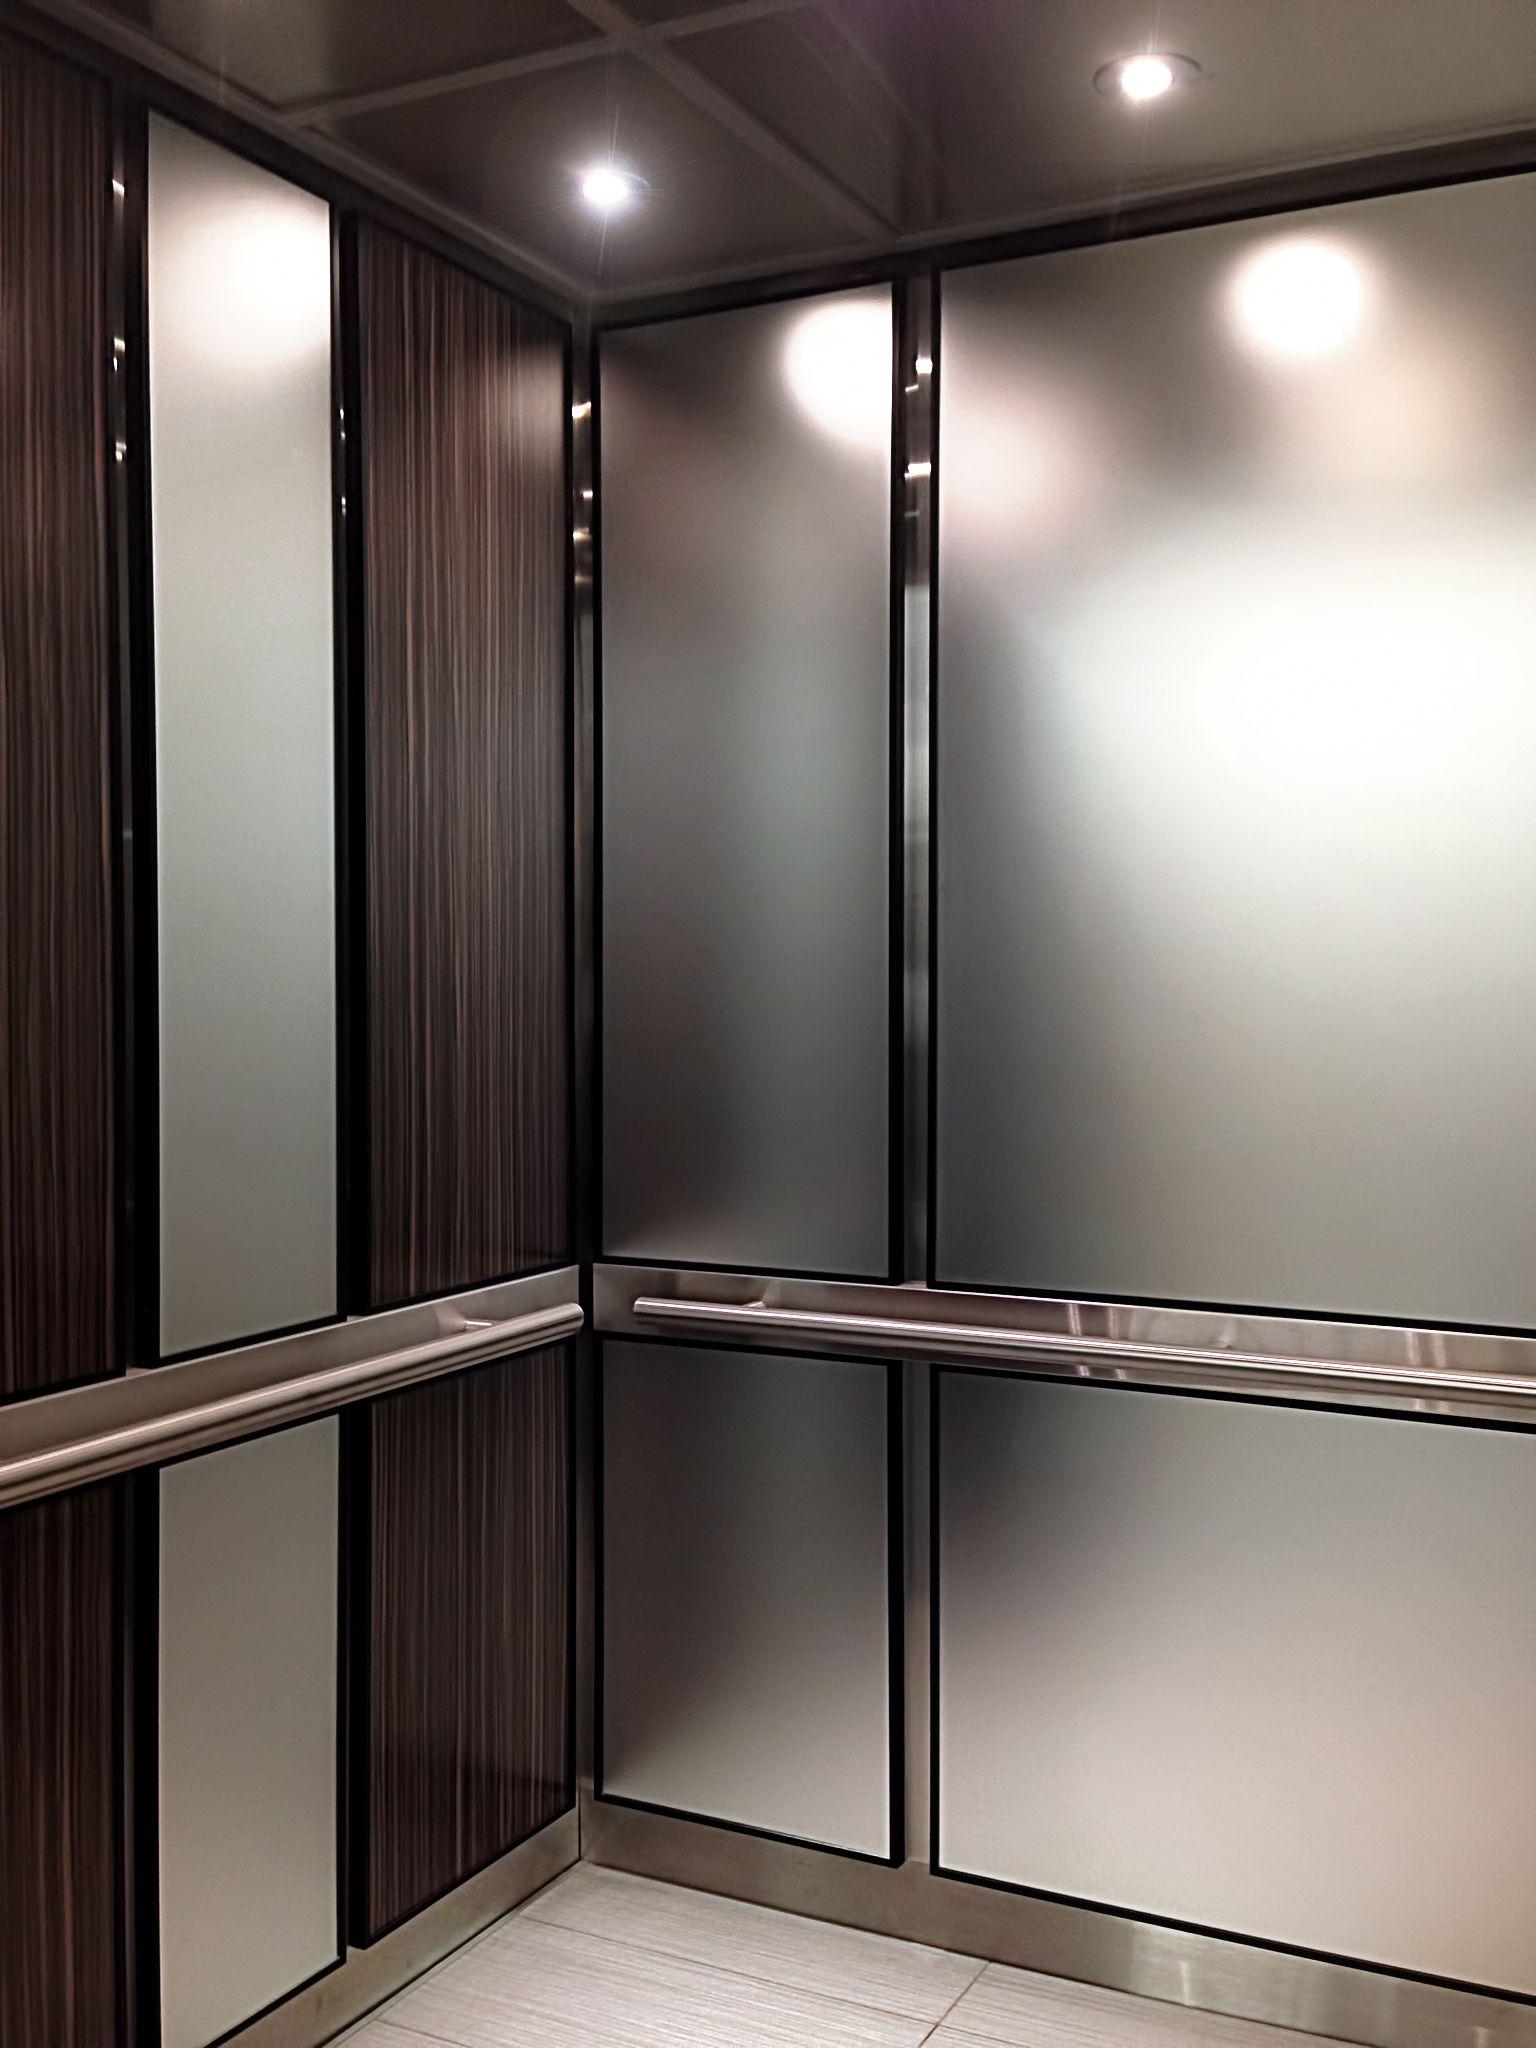 Pin By Premier Elevator On Elevator Interior Design